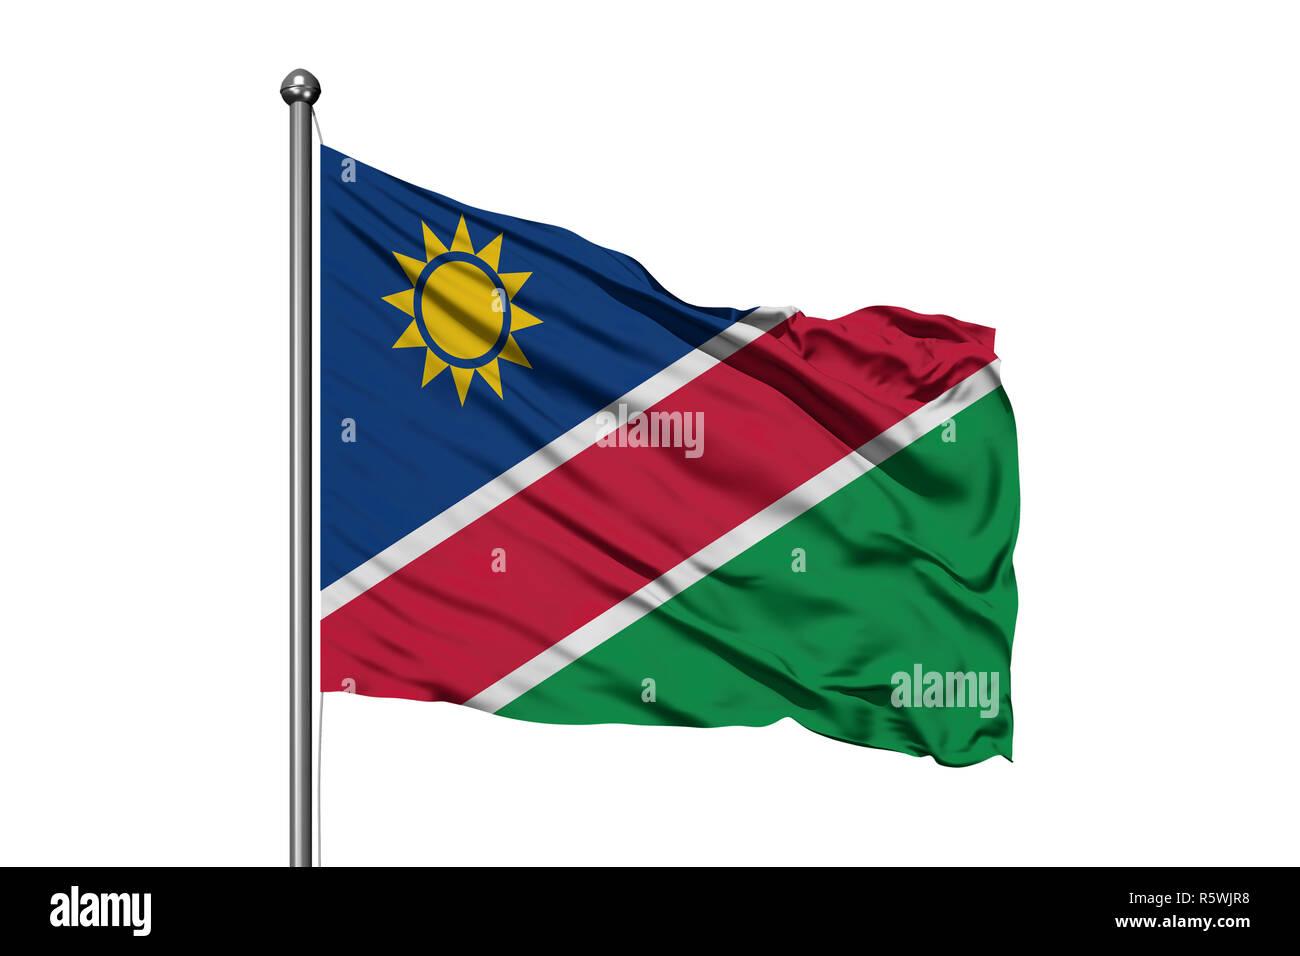 Flag of Namibia waving in the wind, isolated white background. Namibian flag. - Stock Image